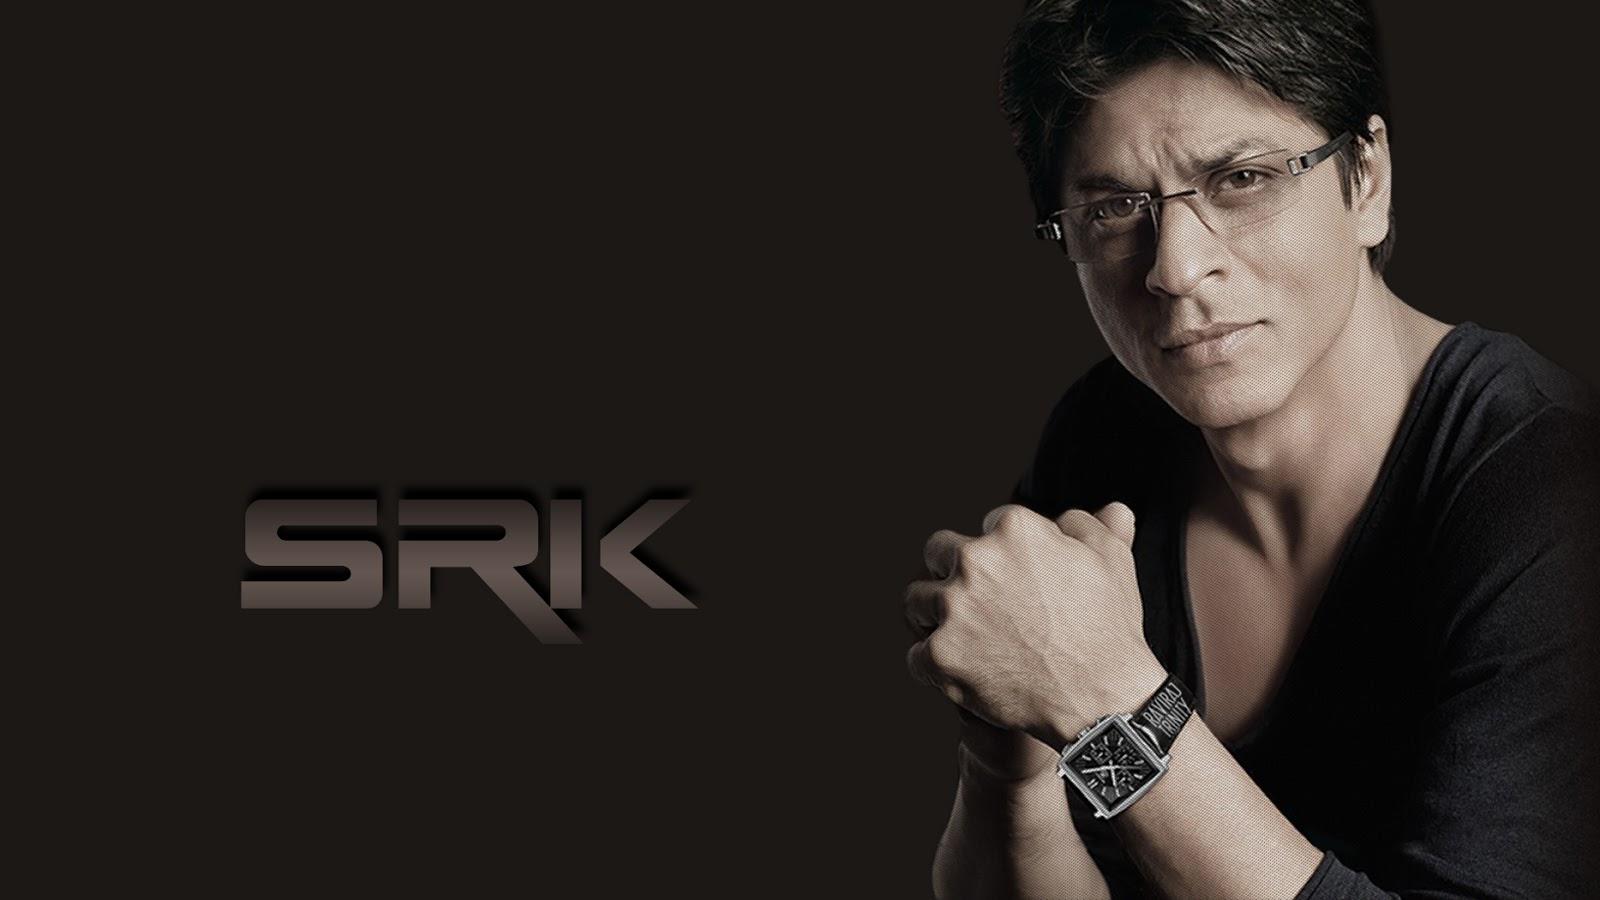 Celebrity Model Wallpaper Shahrukh khan HD wallpapers 1080p 1600x900